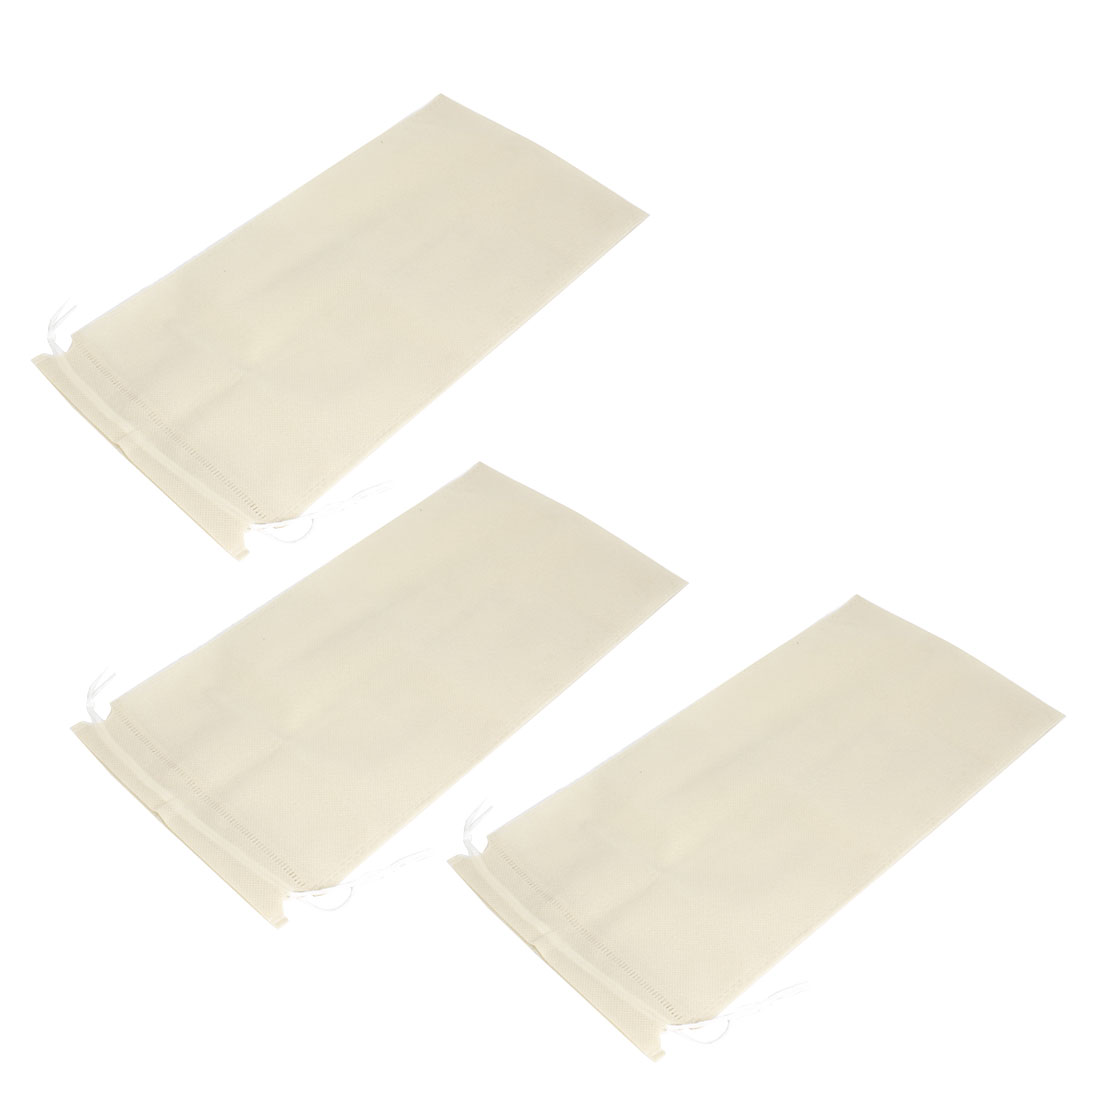 3 Pcs Beige Drawstring Cinch Rectangular Storage Bags Holder 37cm x 19cm